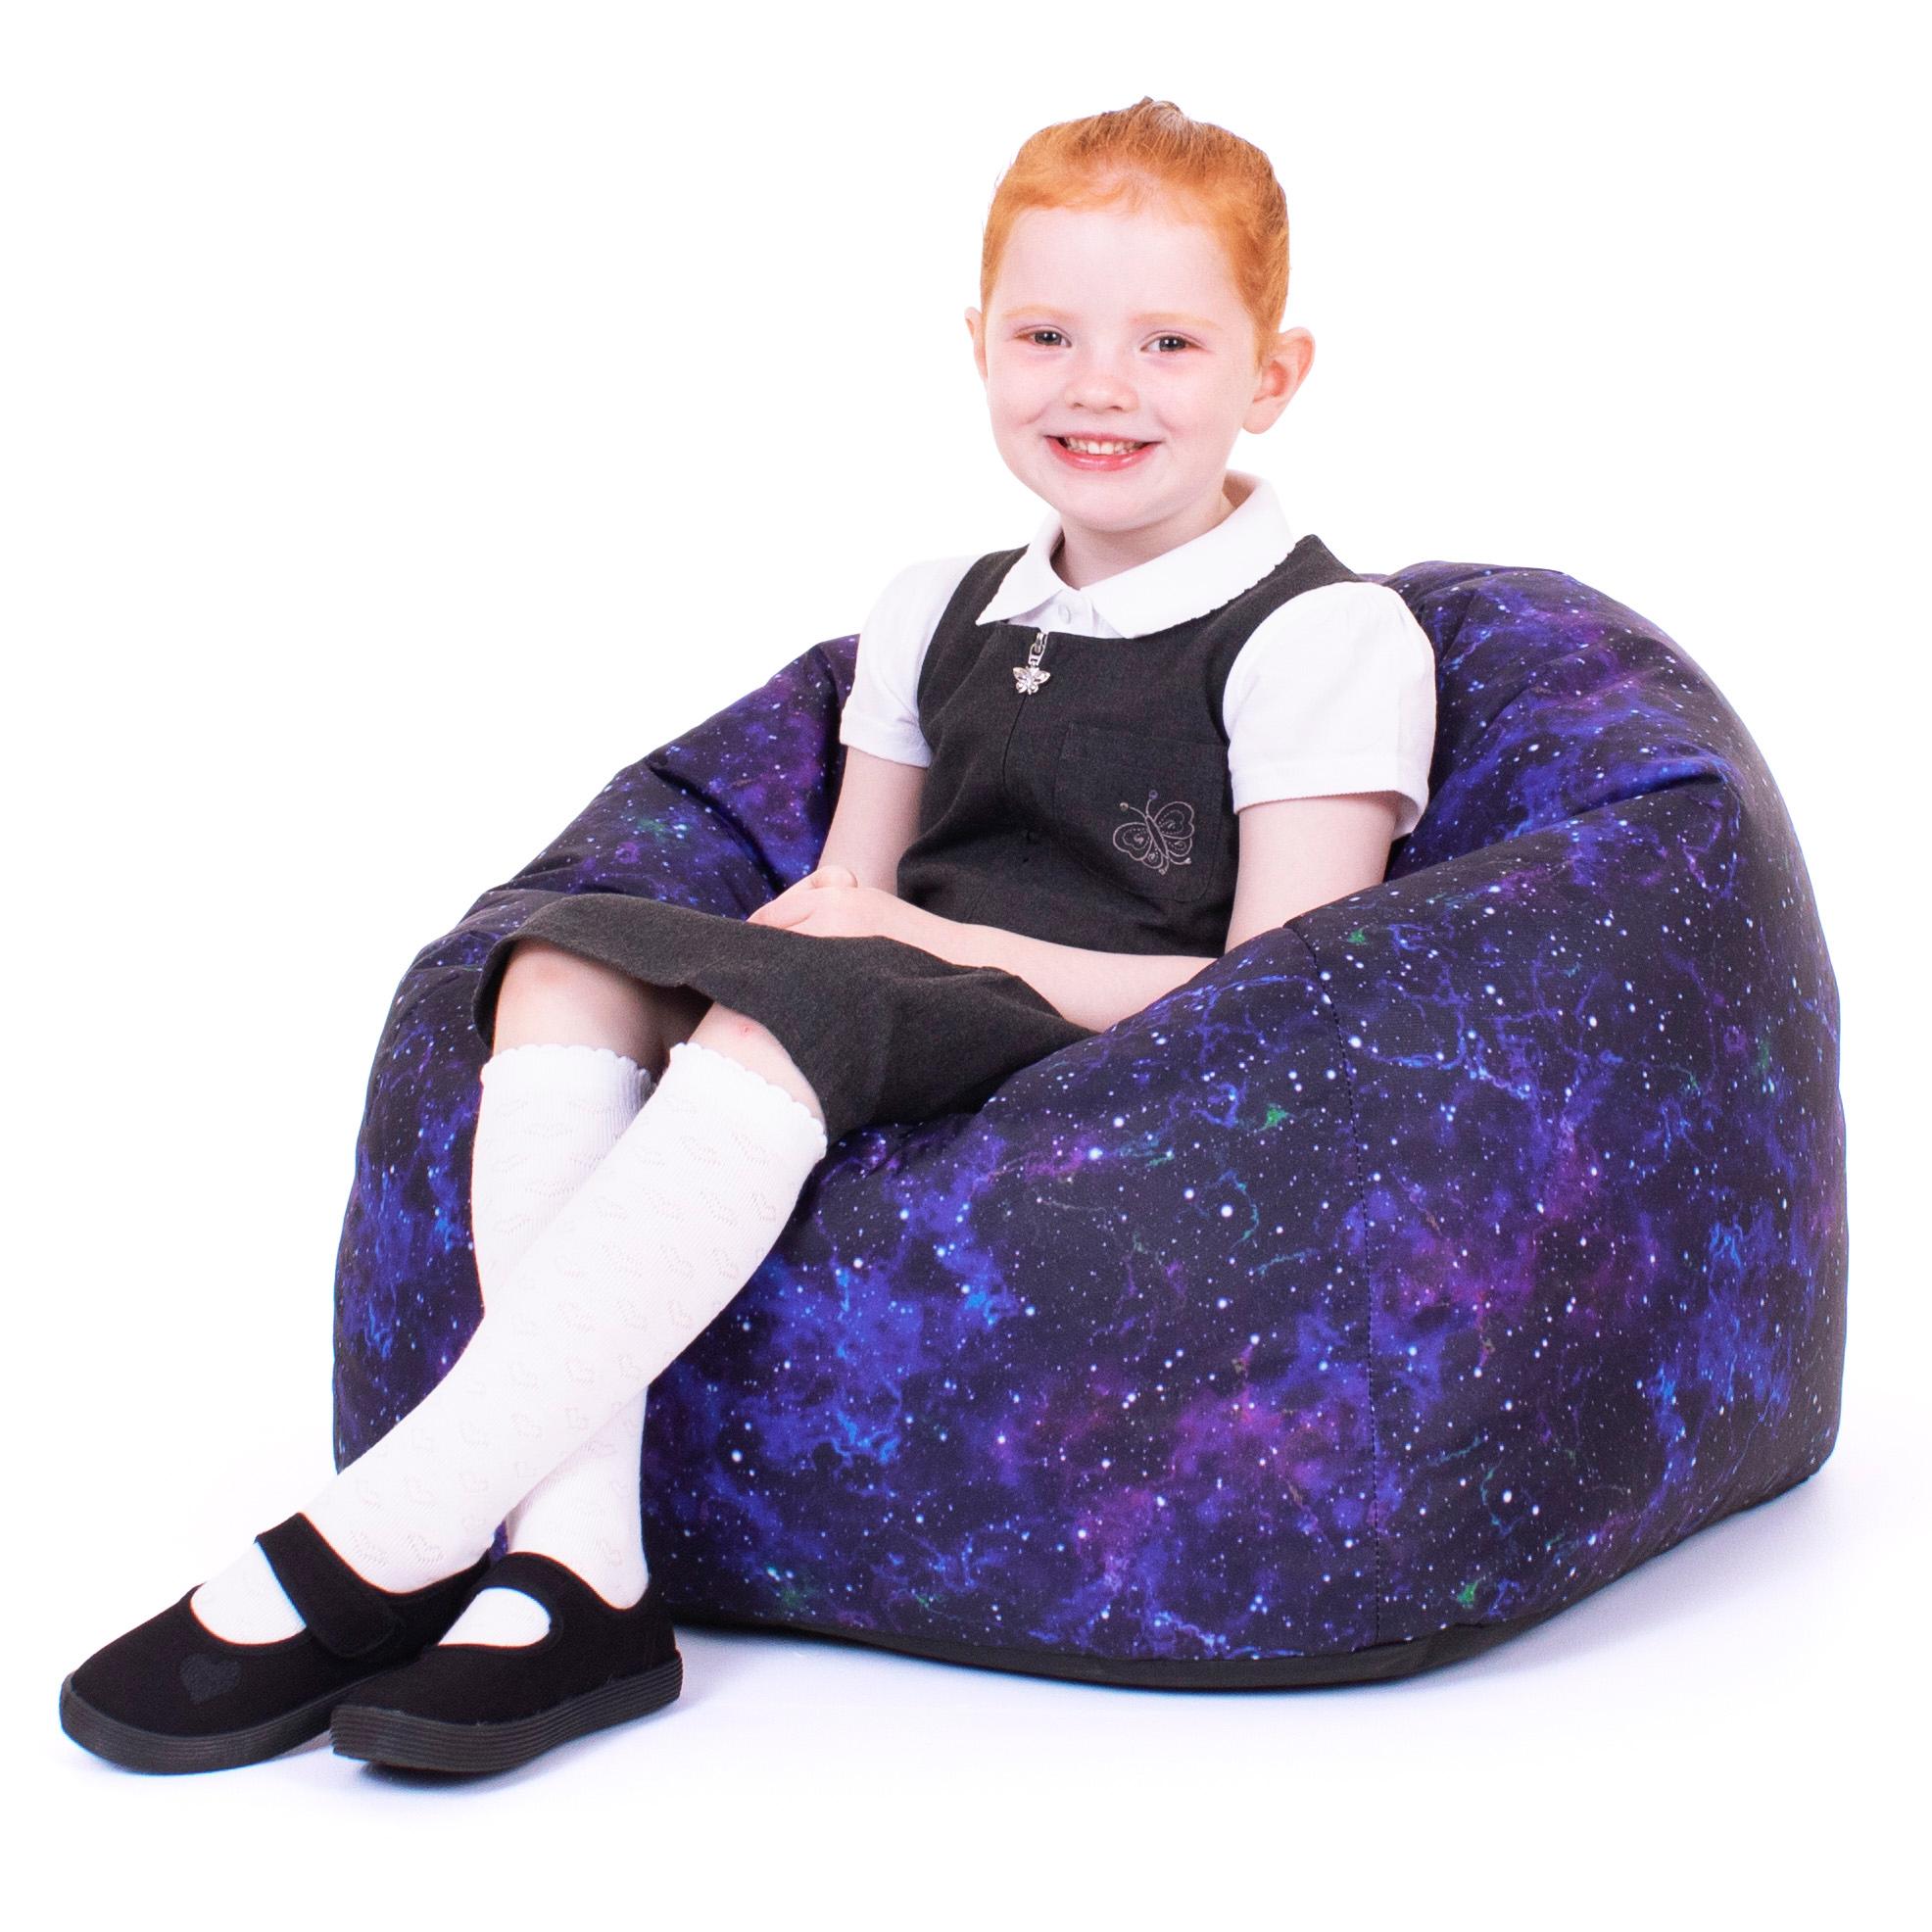 Eden-Primary-Bean-Bag-Galaxy-Print-300dpi-2.jpg